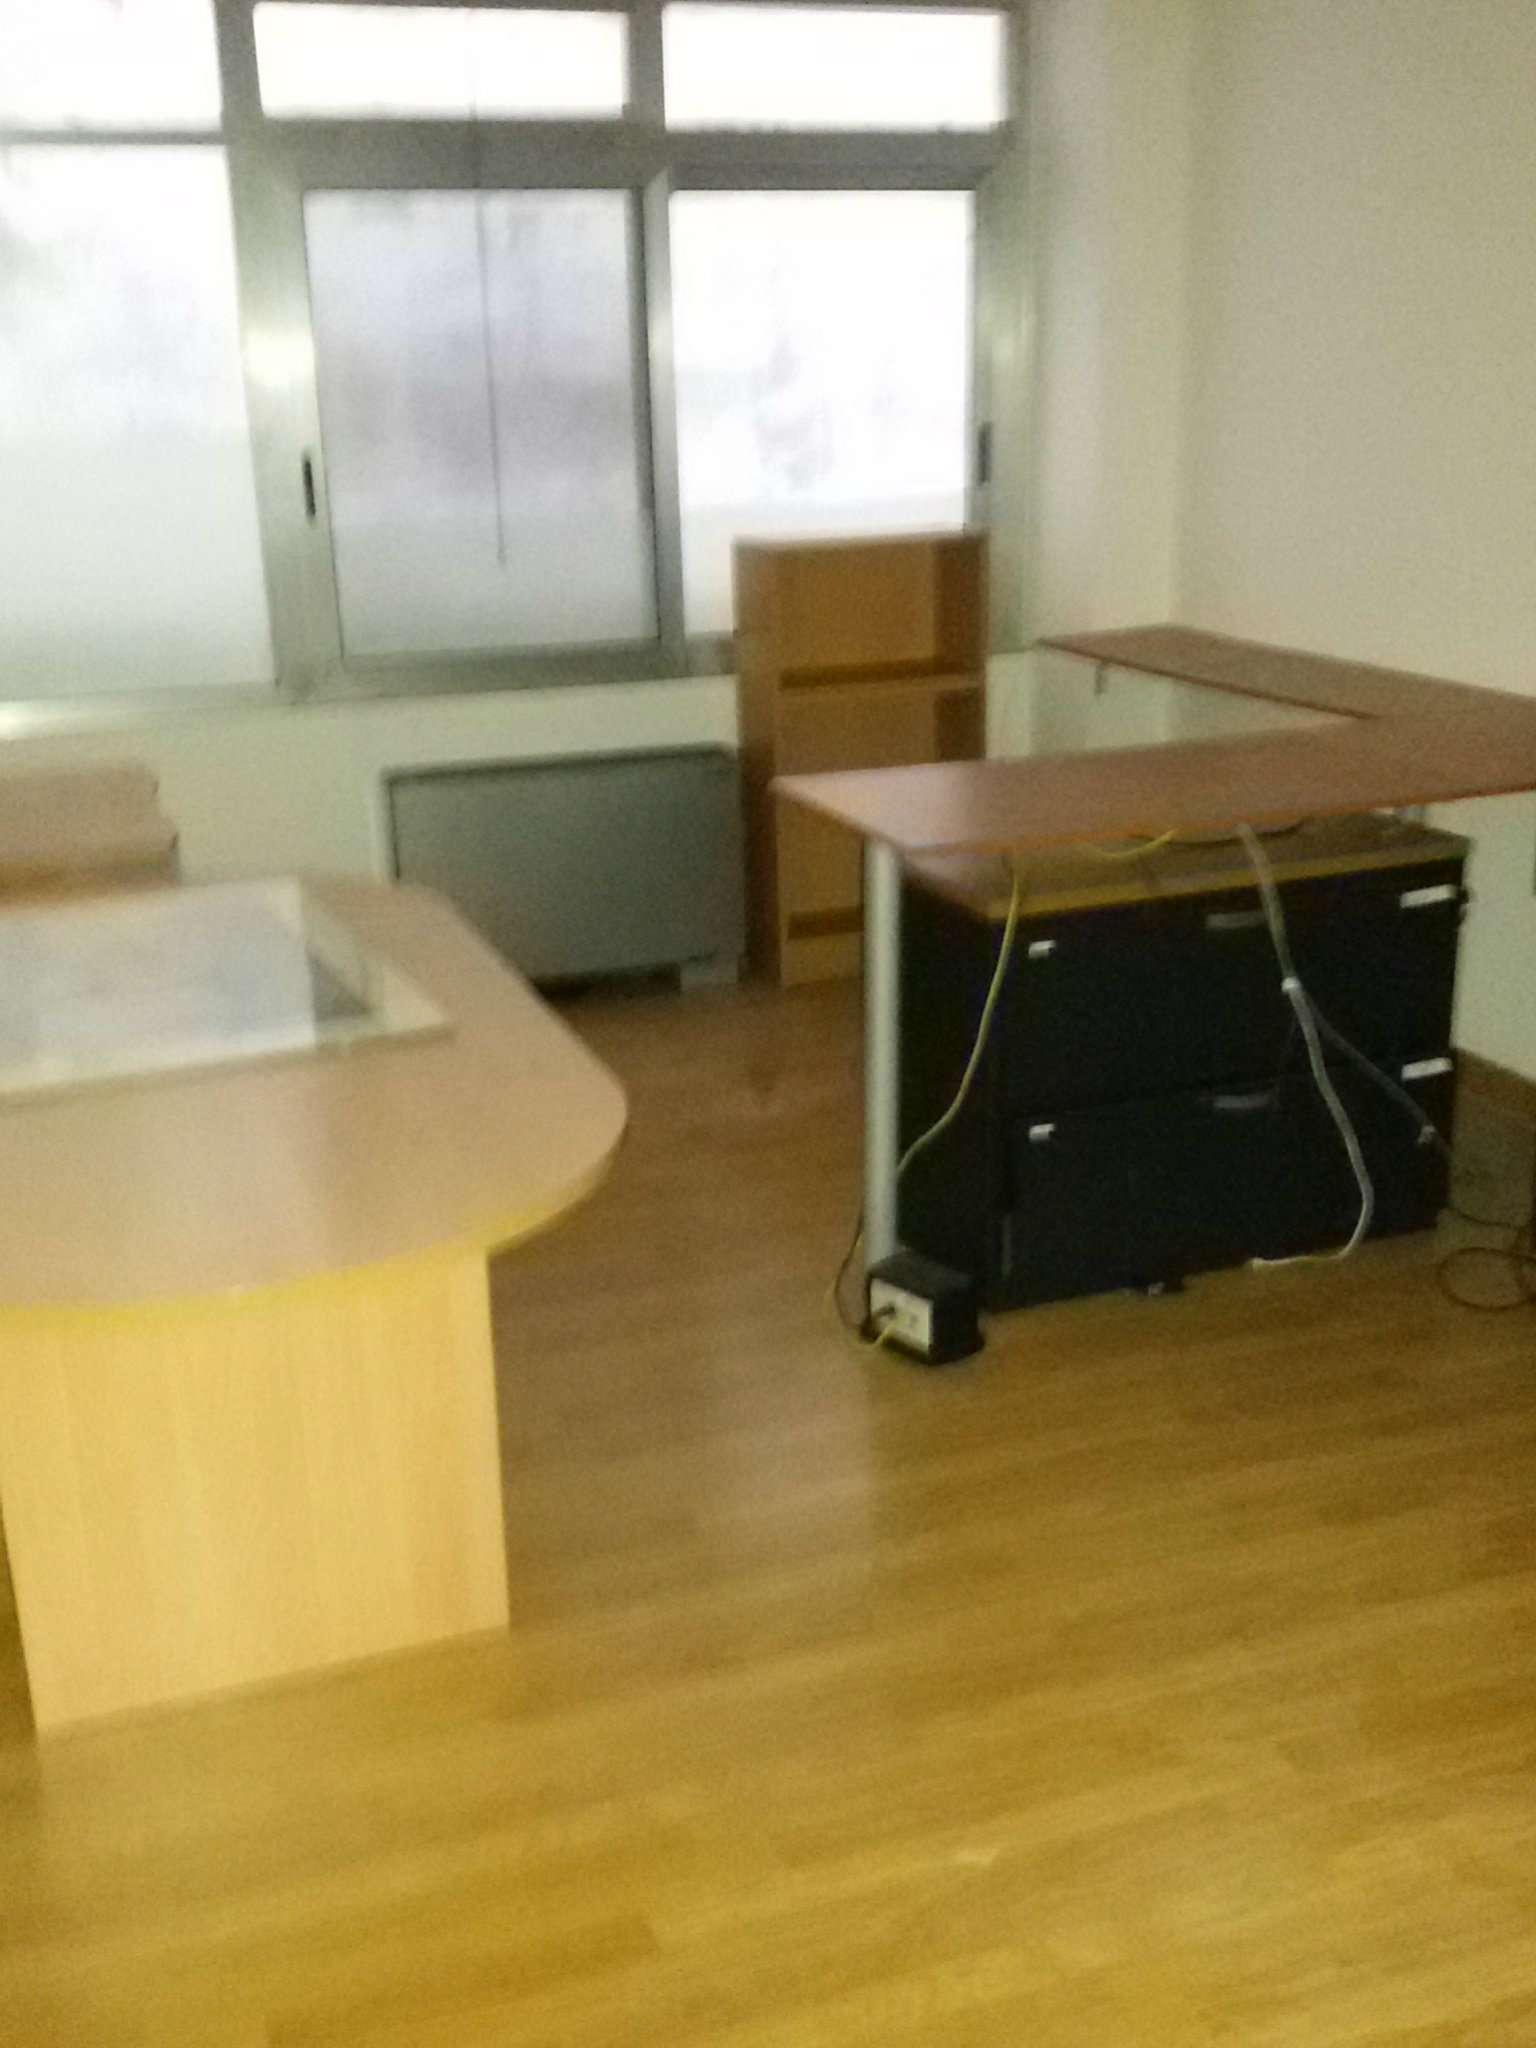 Ufficio studio roma affitto 4500 euro zona 22 eur 22 for Affittasi studio roma prati